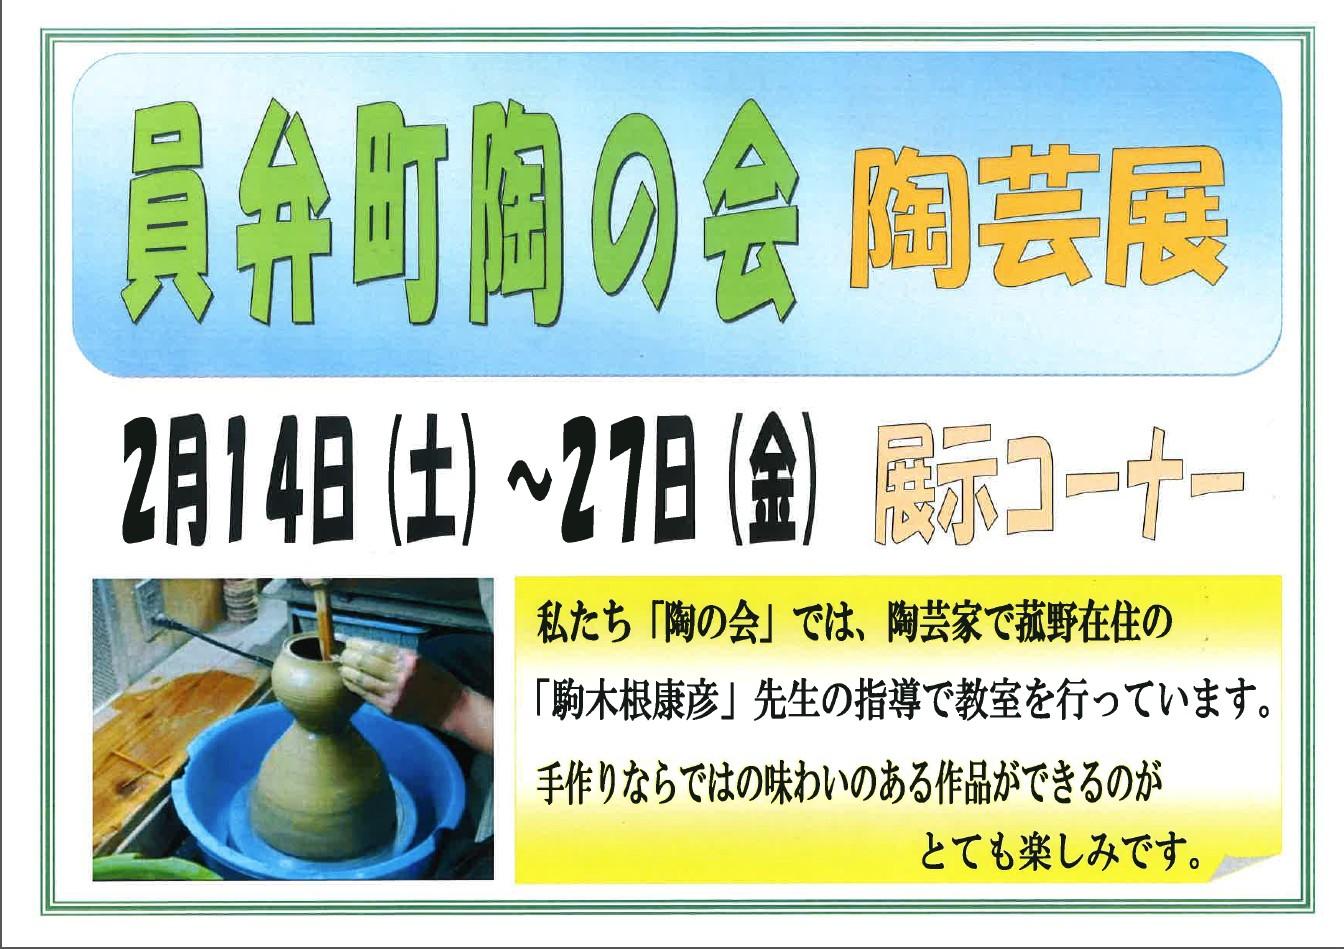 http://www.ajisainosato.com/info/images/2015y01m30d_113019221.jpg